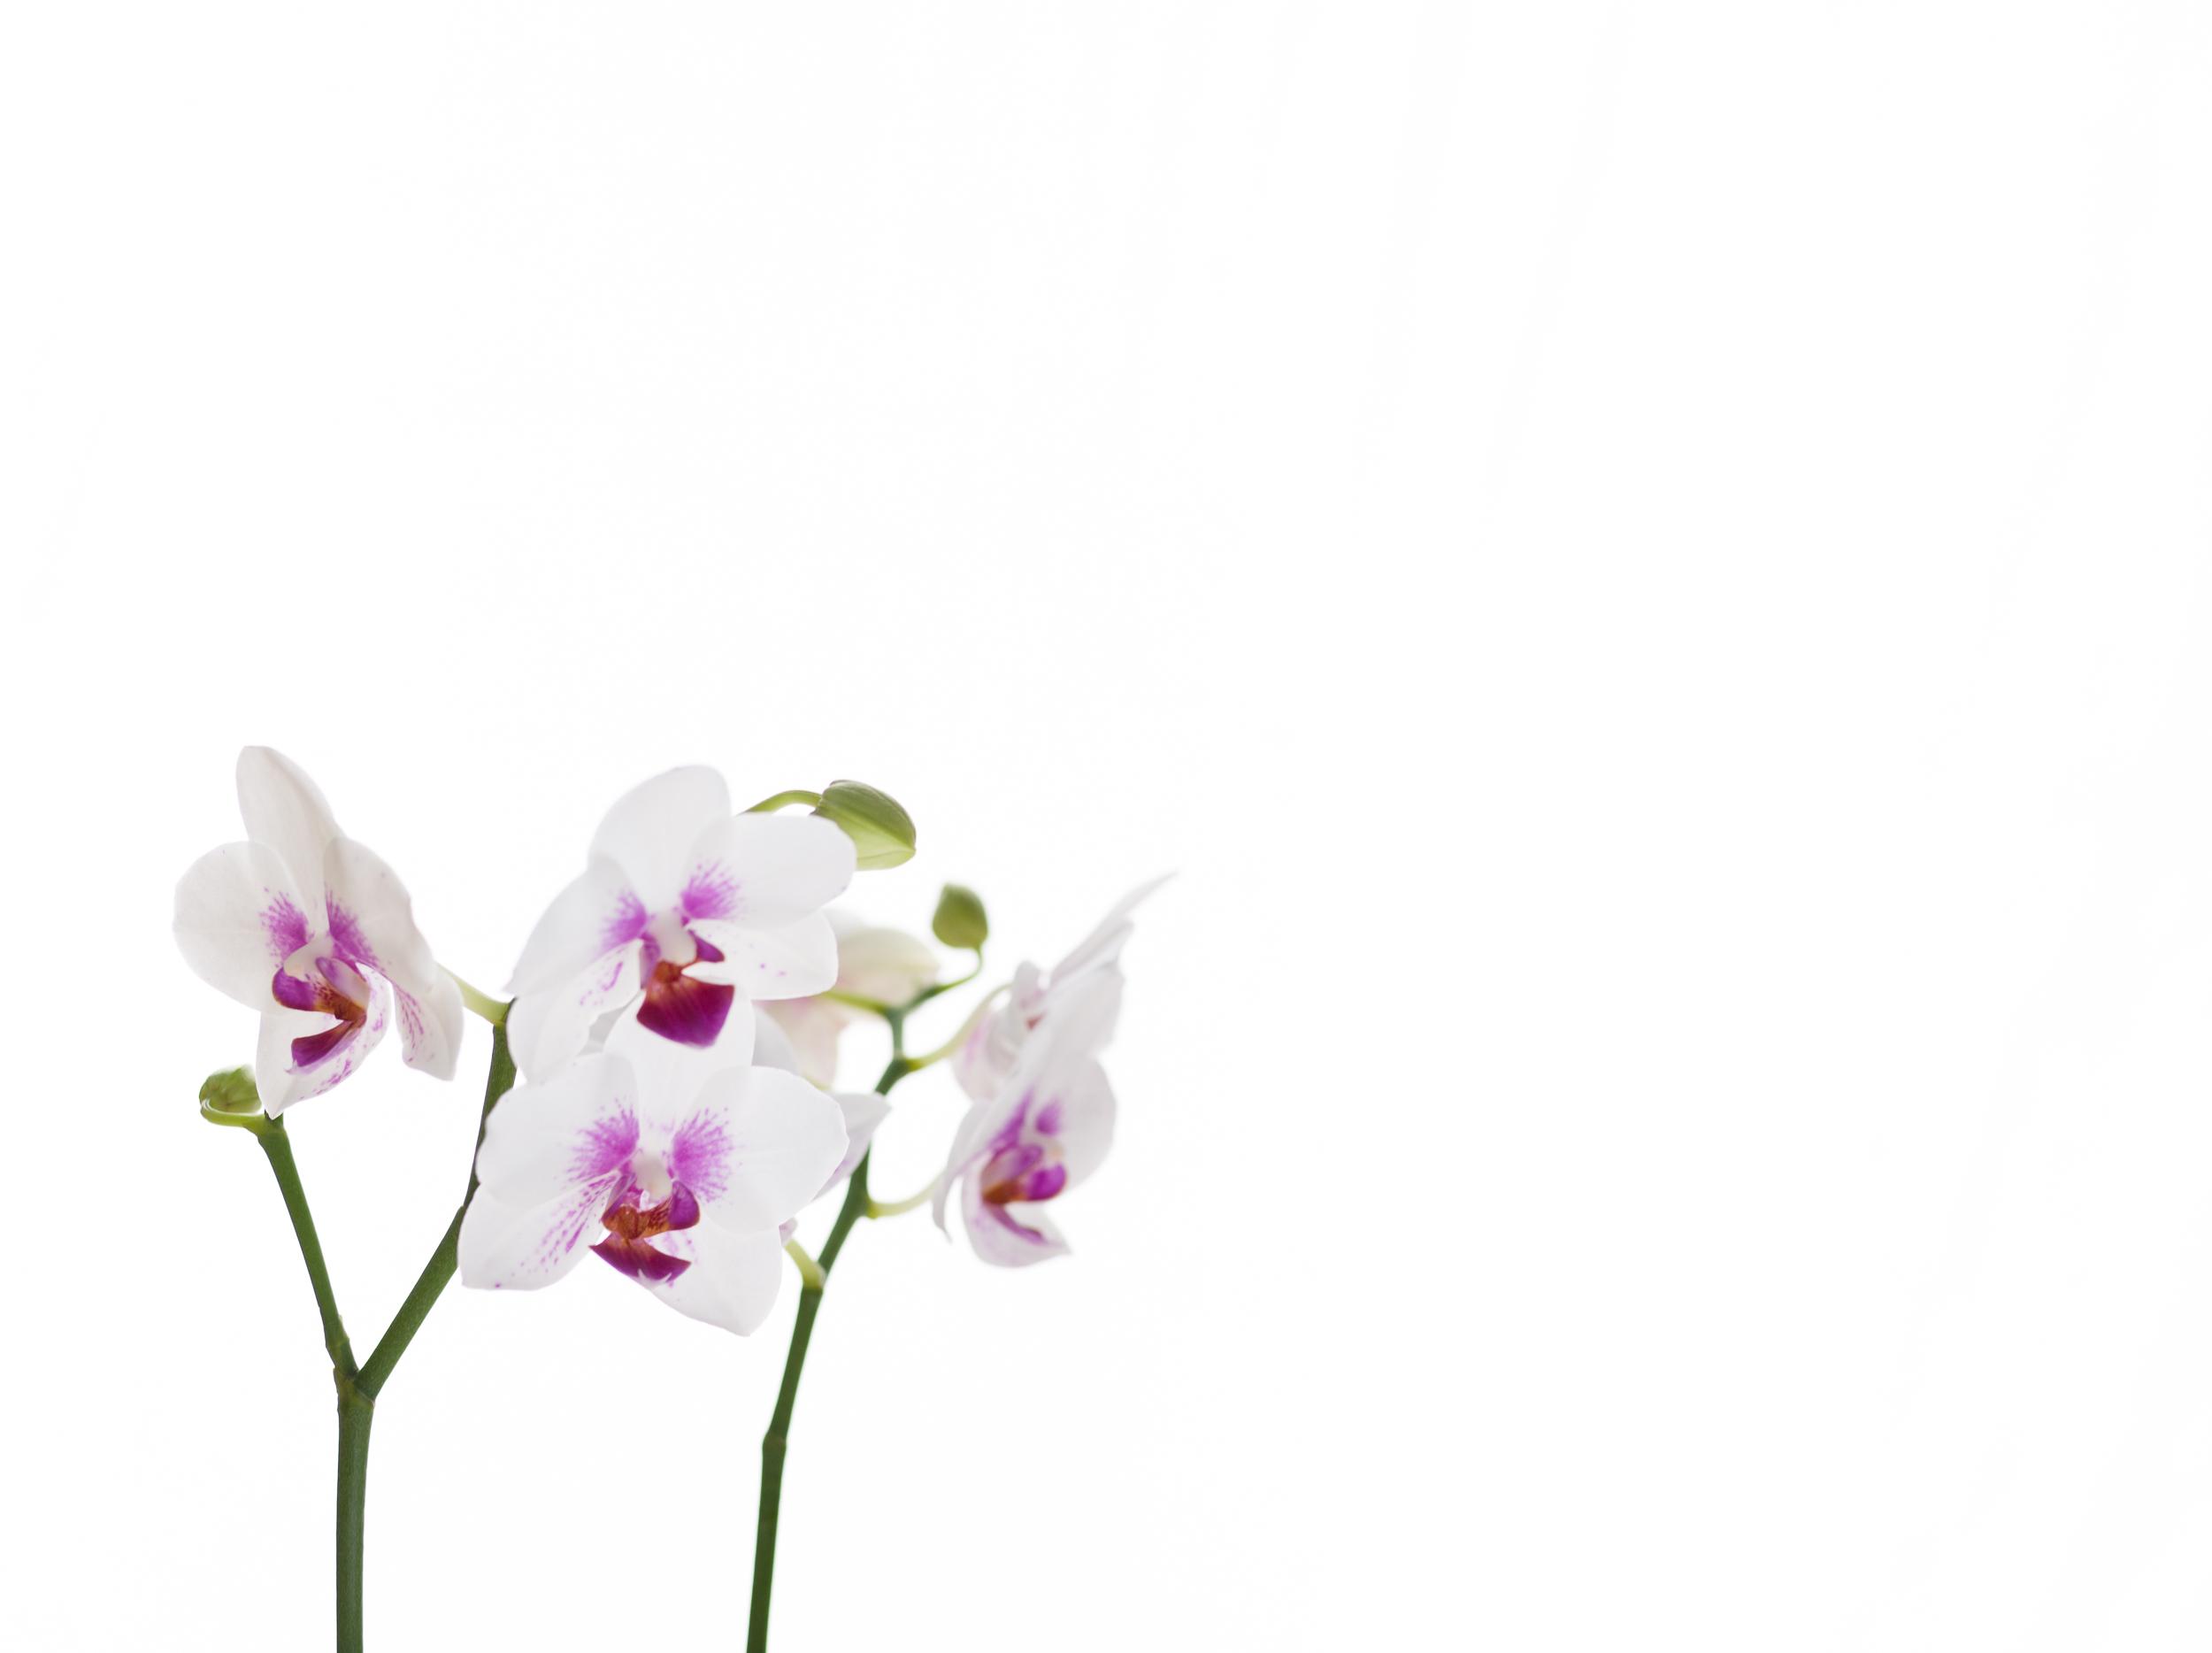 Fine-Art-Print-Kaz-Photo-Works-62.jpg